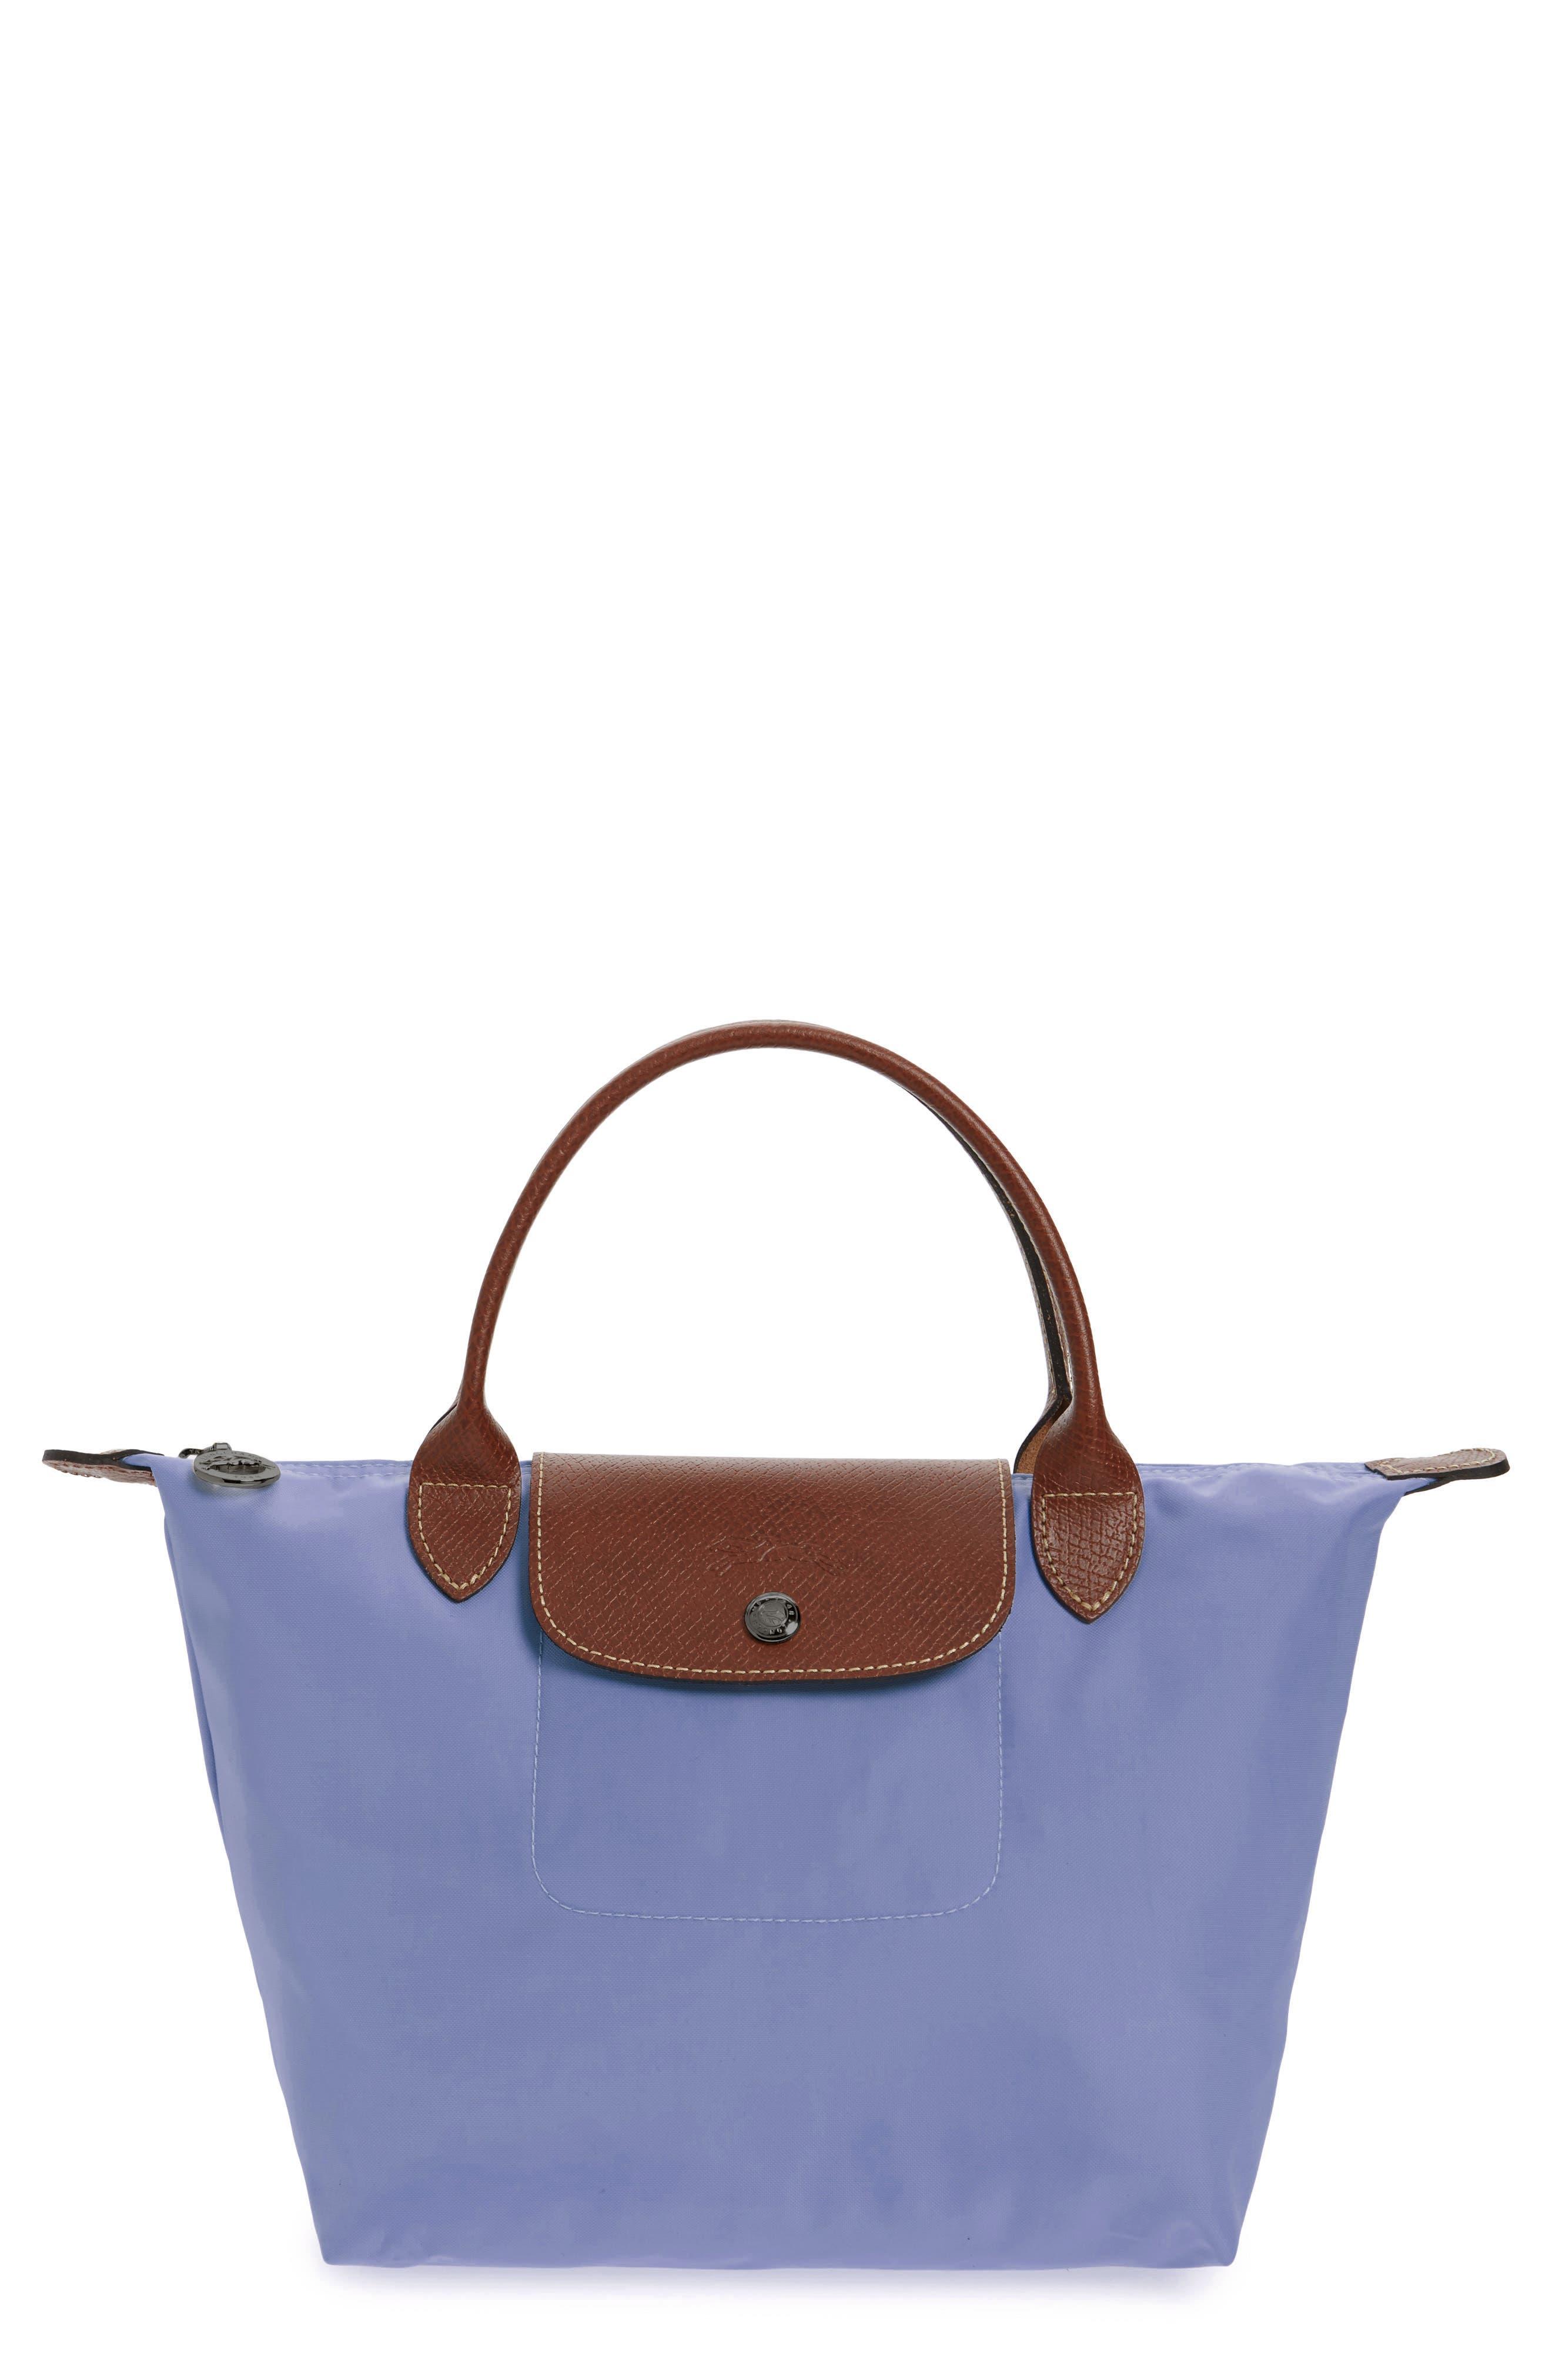 Longchamp 'Small Le Pliage' Top Handle Tote